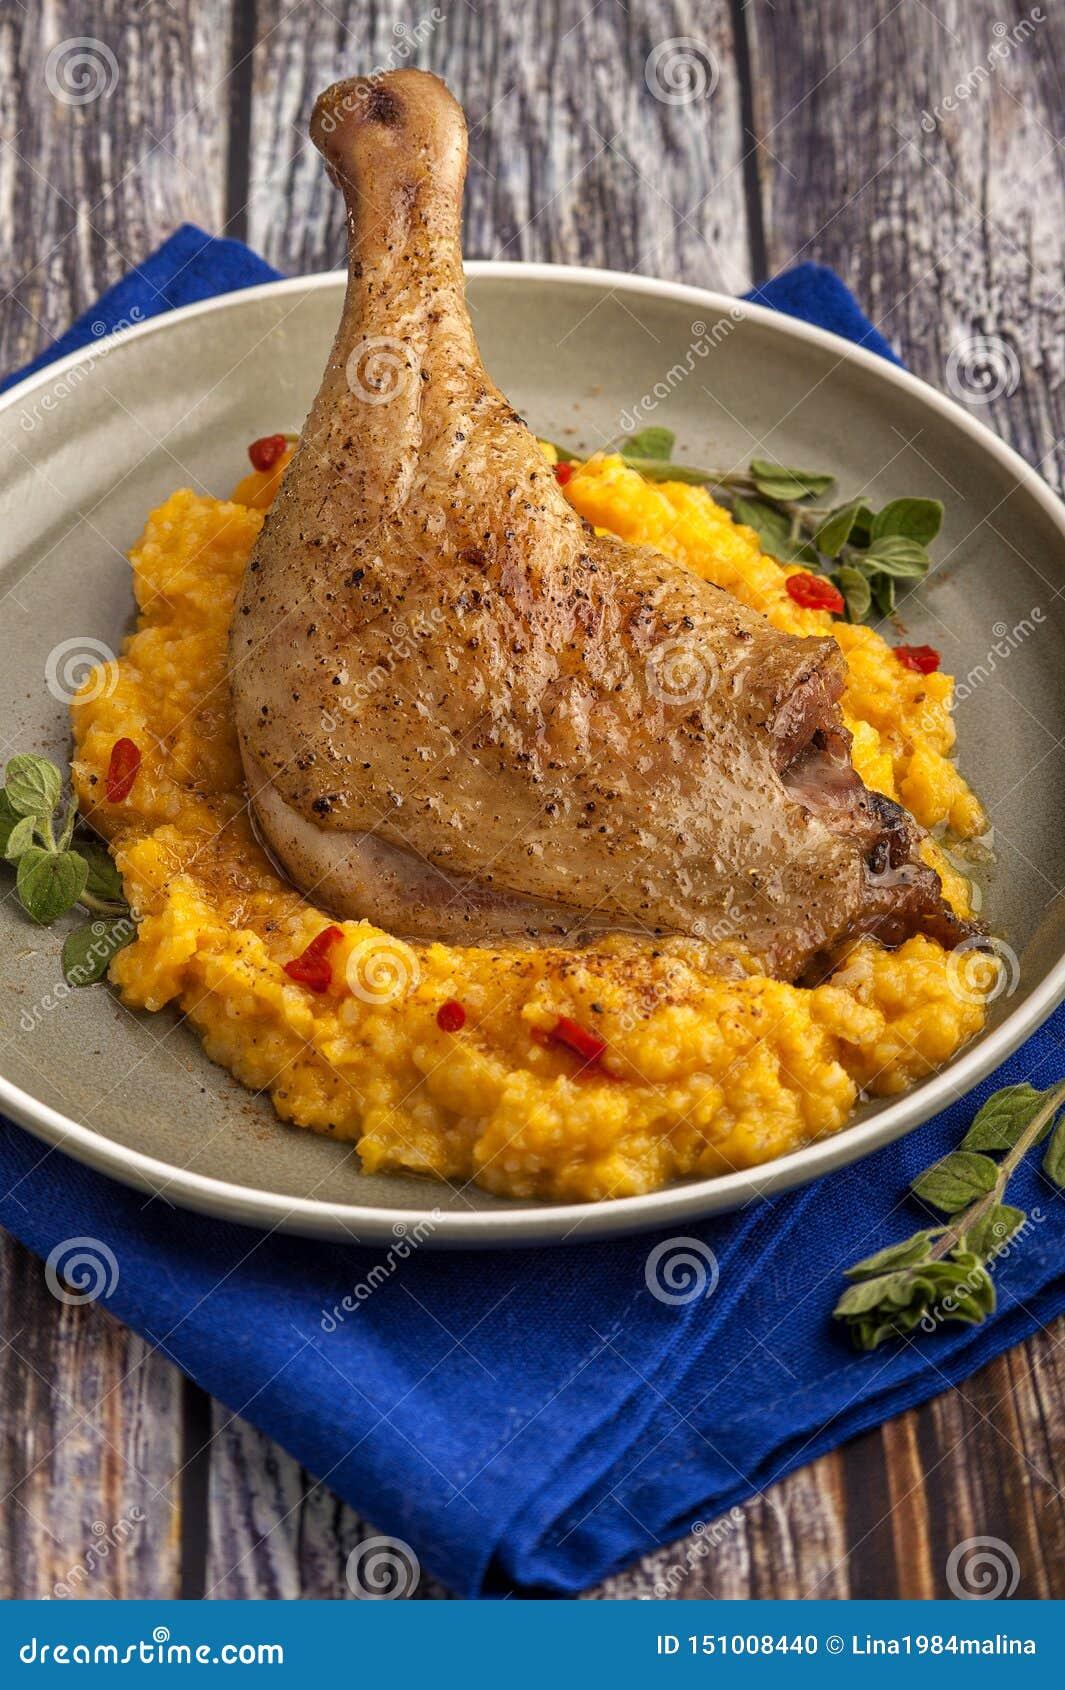 Roasted duck leg with pumpkin puree